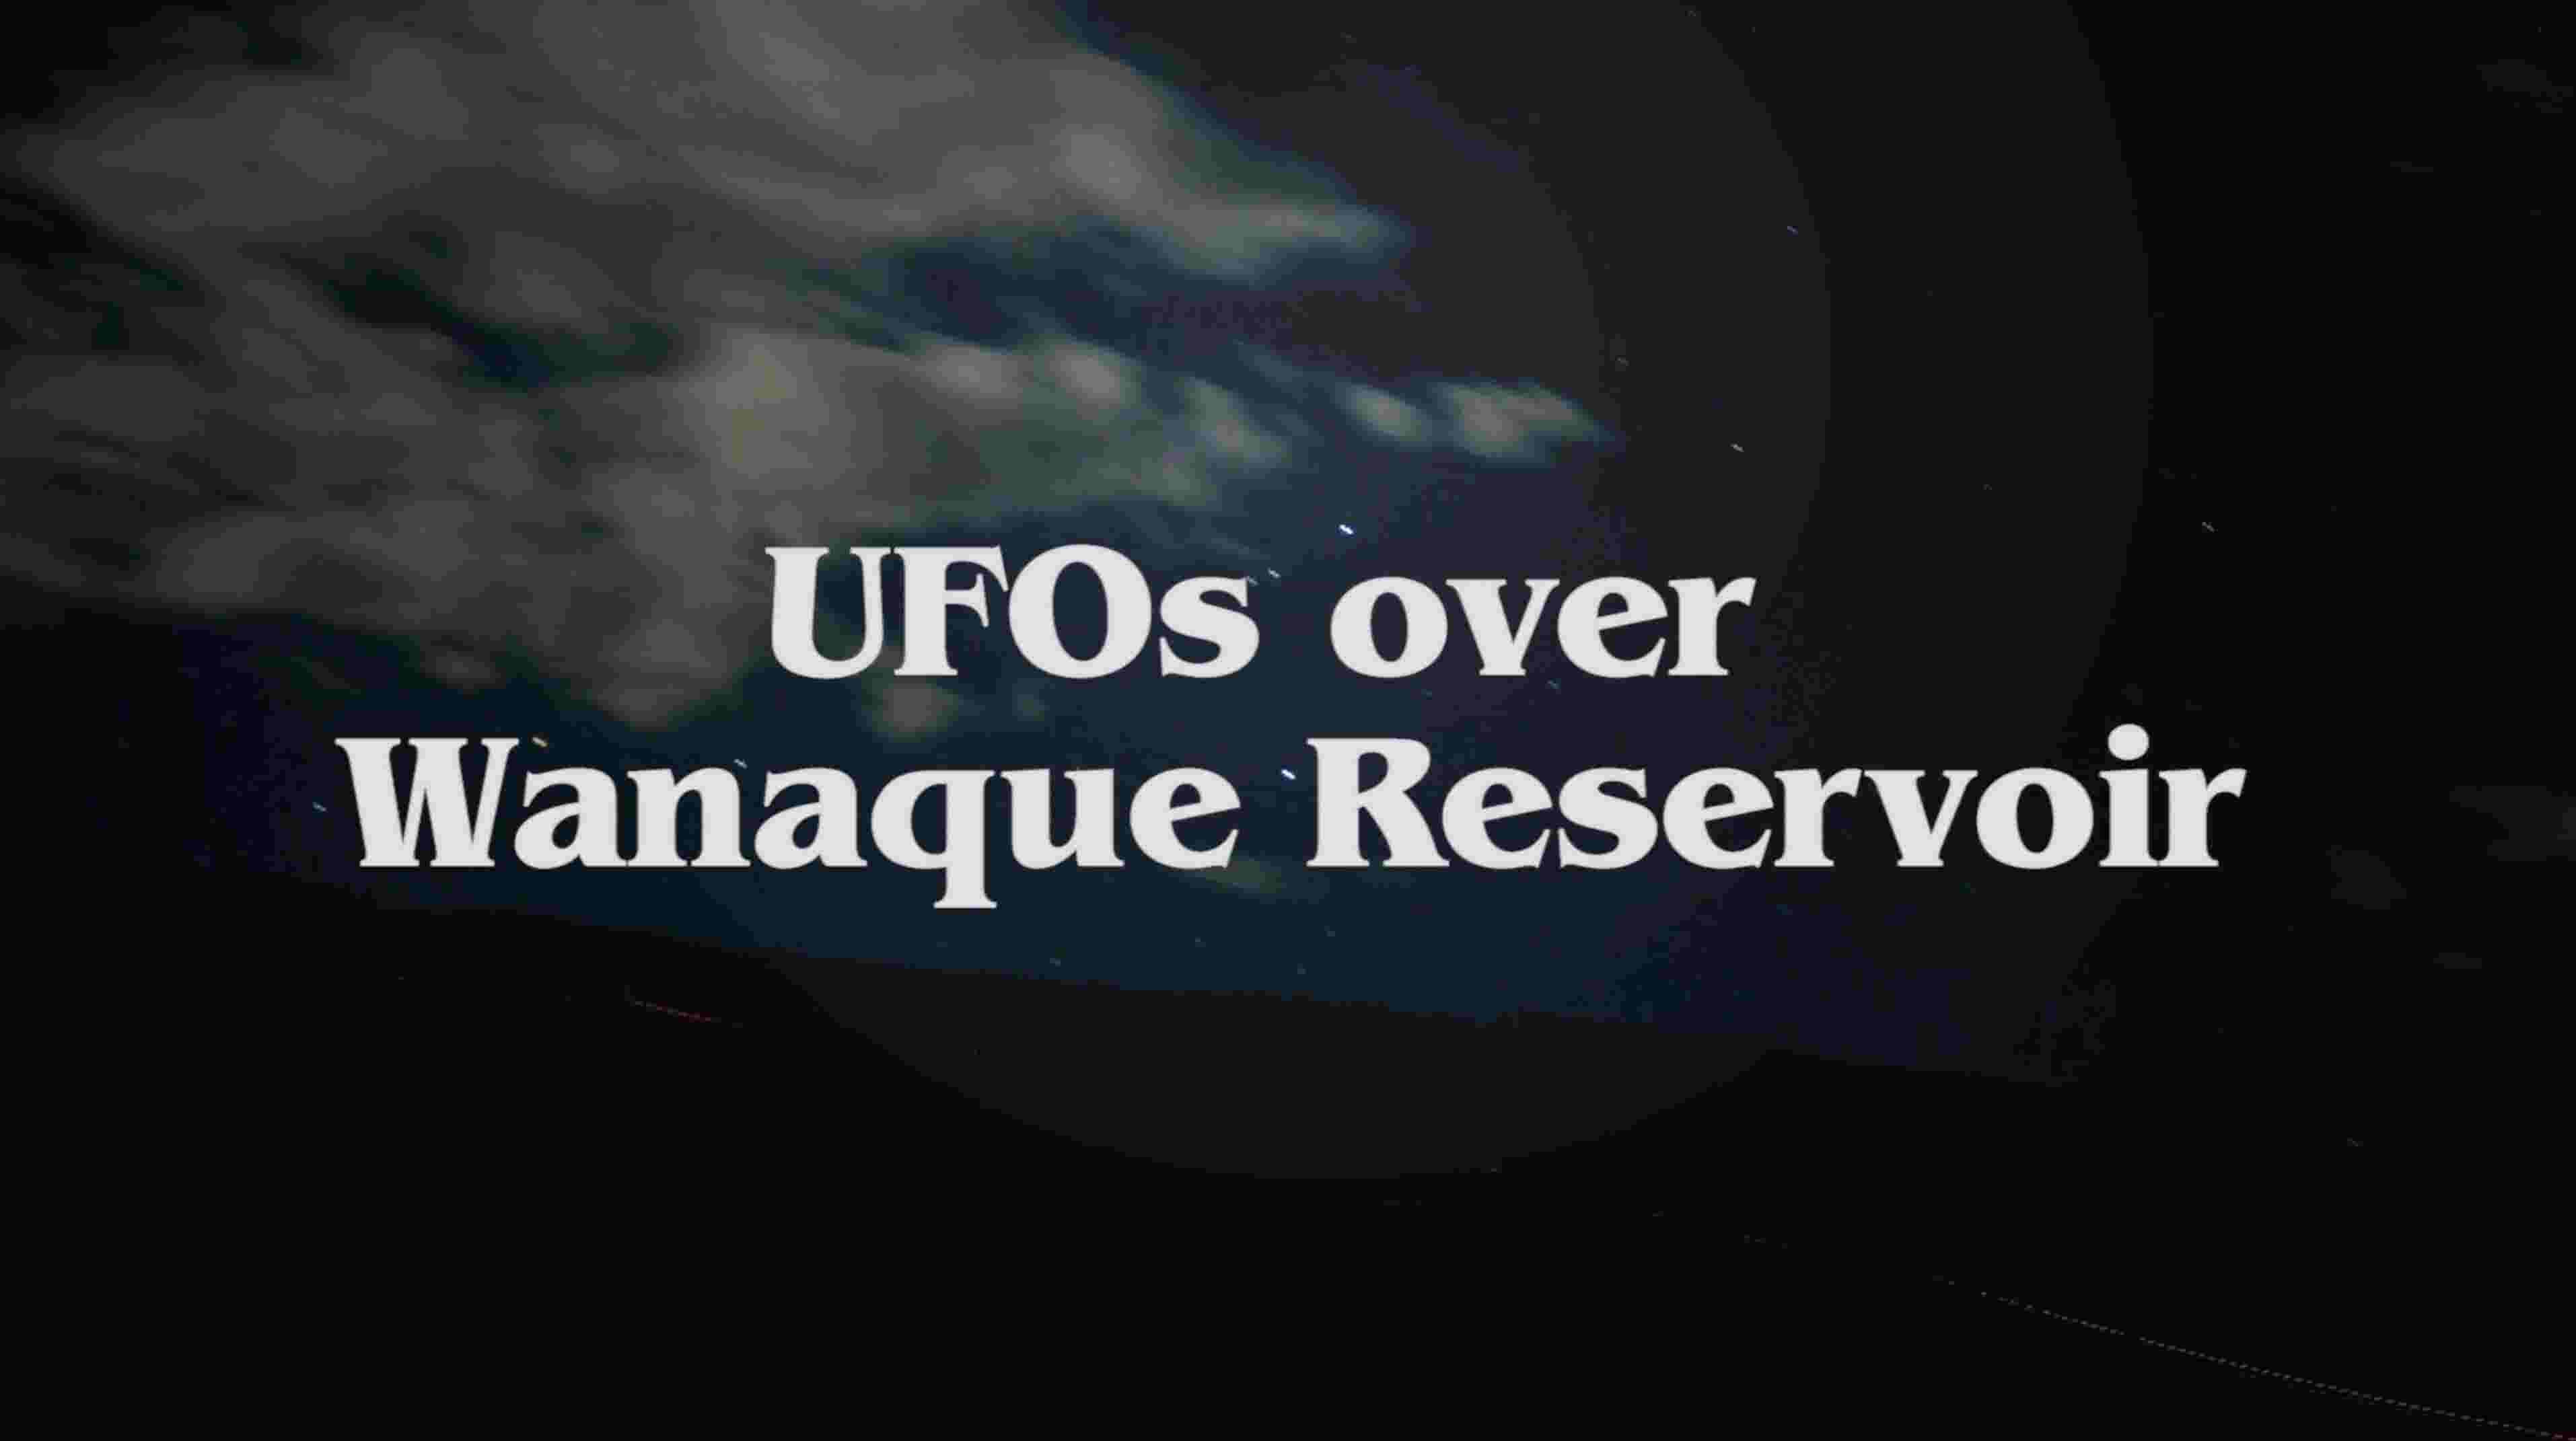 Stranger Jersey: UFOs over Wanaque Reservoir